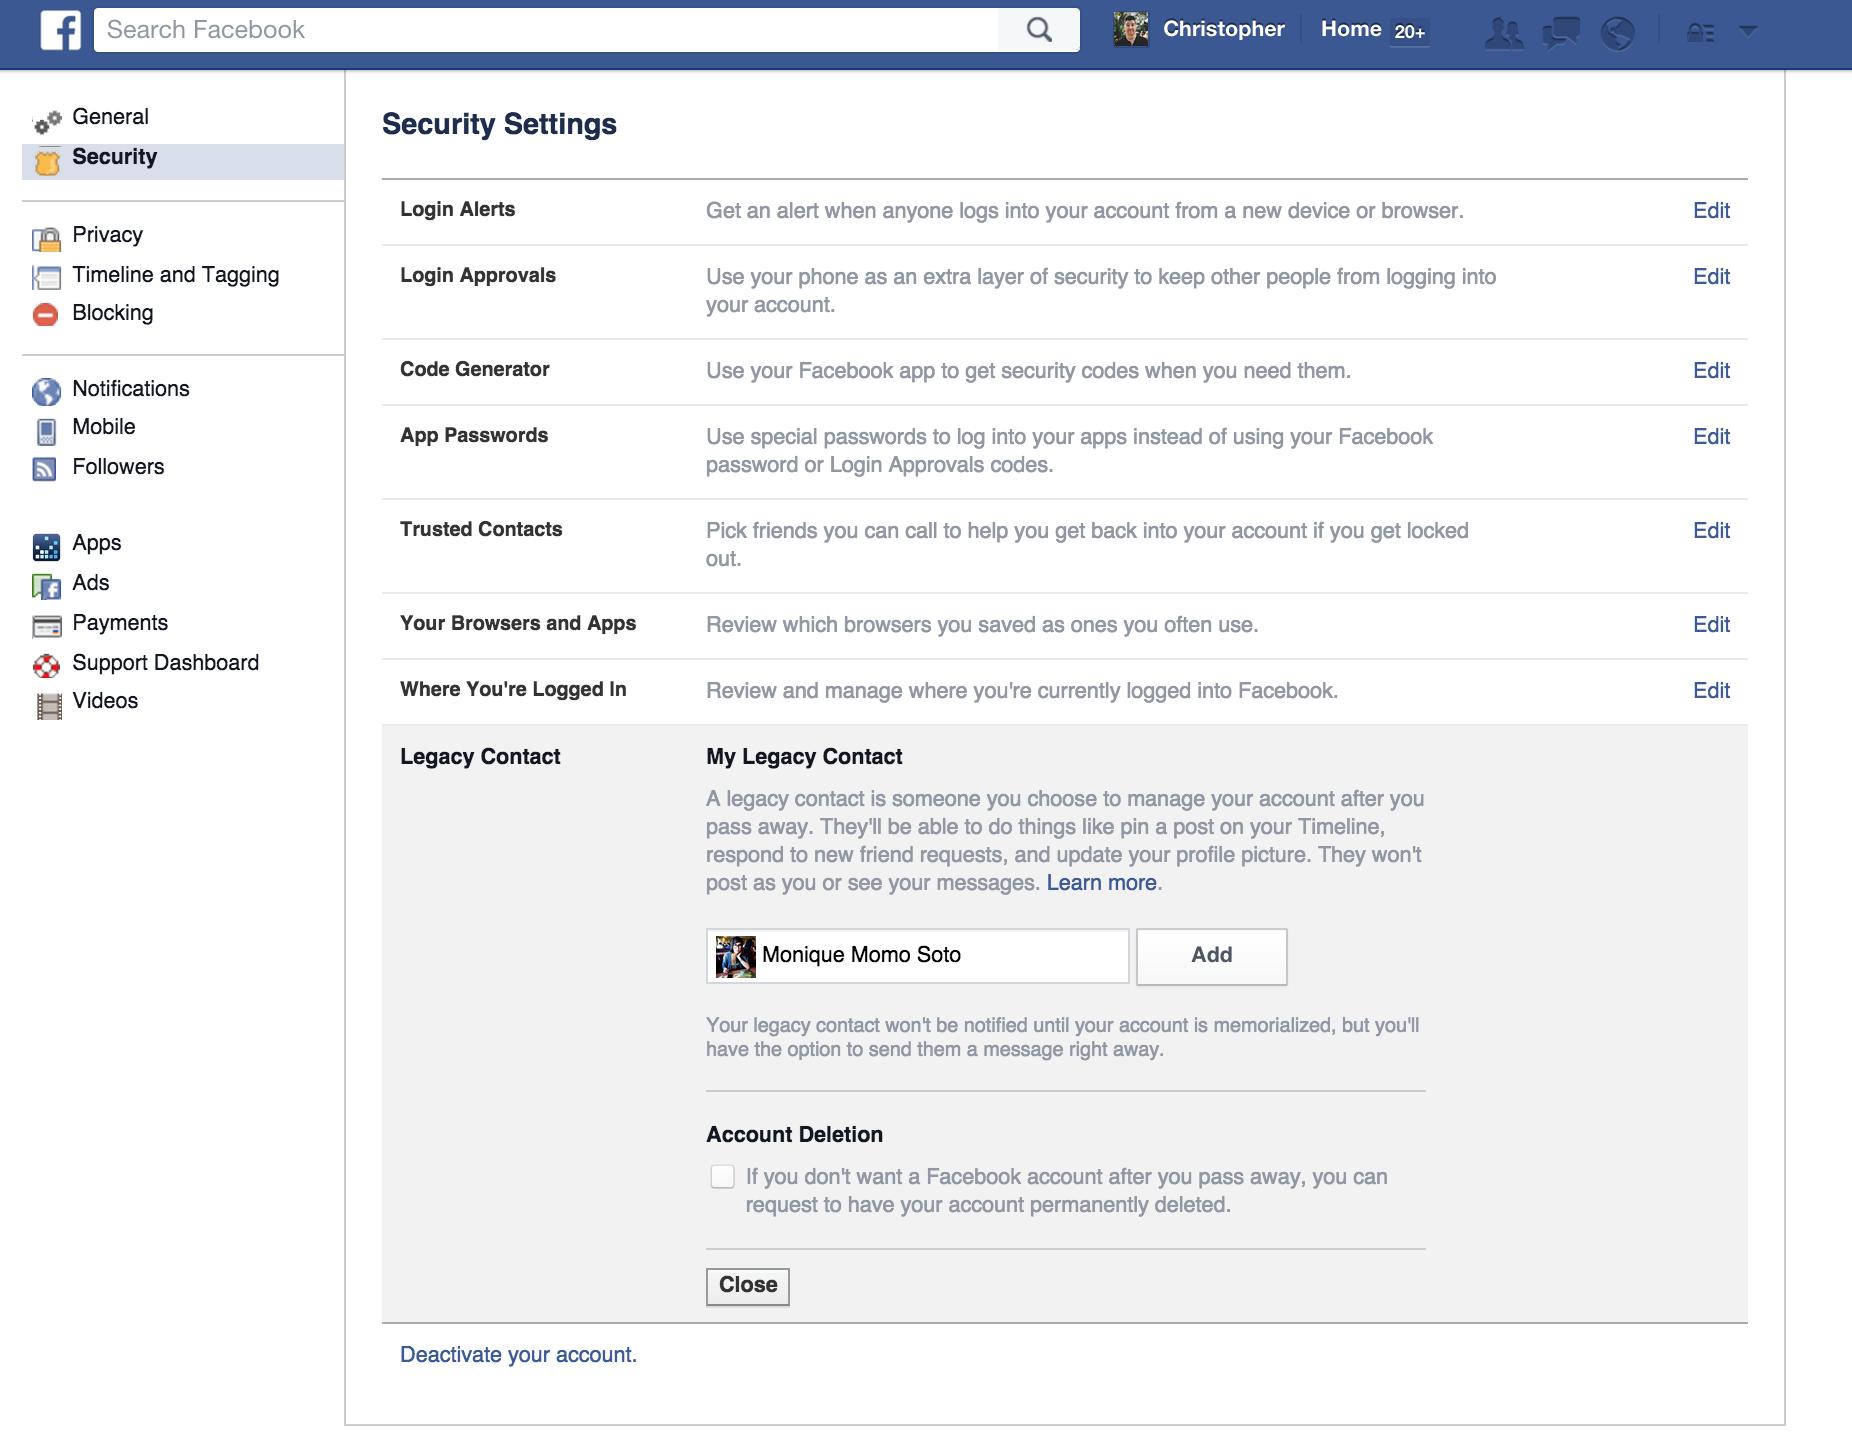 Facebook-Security-Legacy-Contact-1